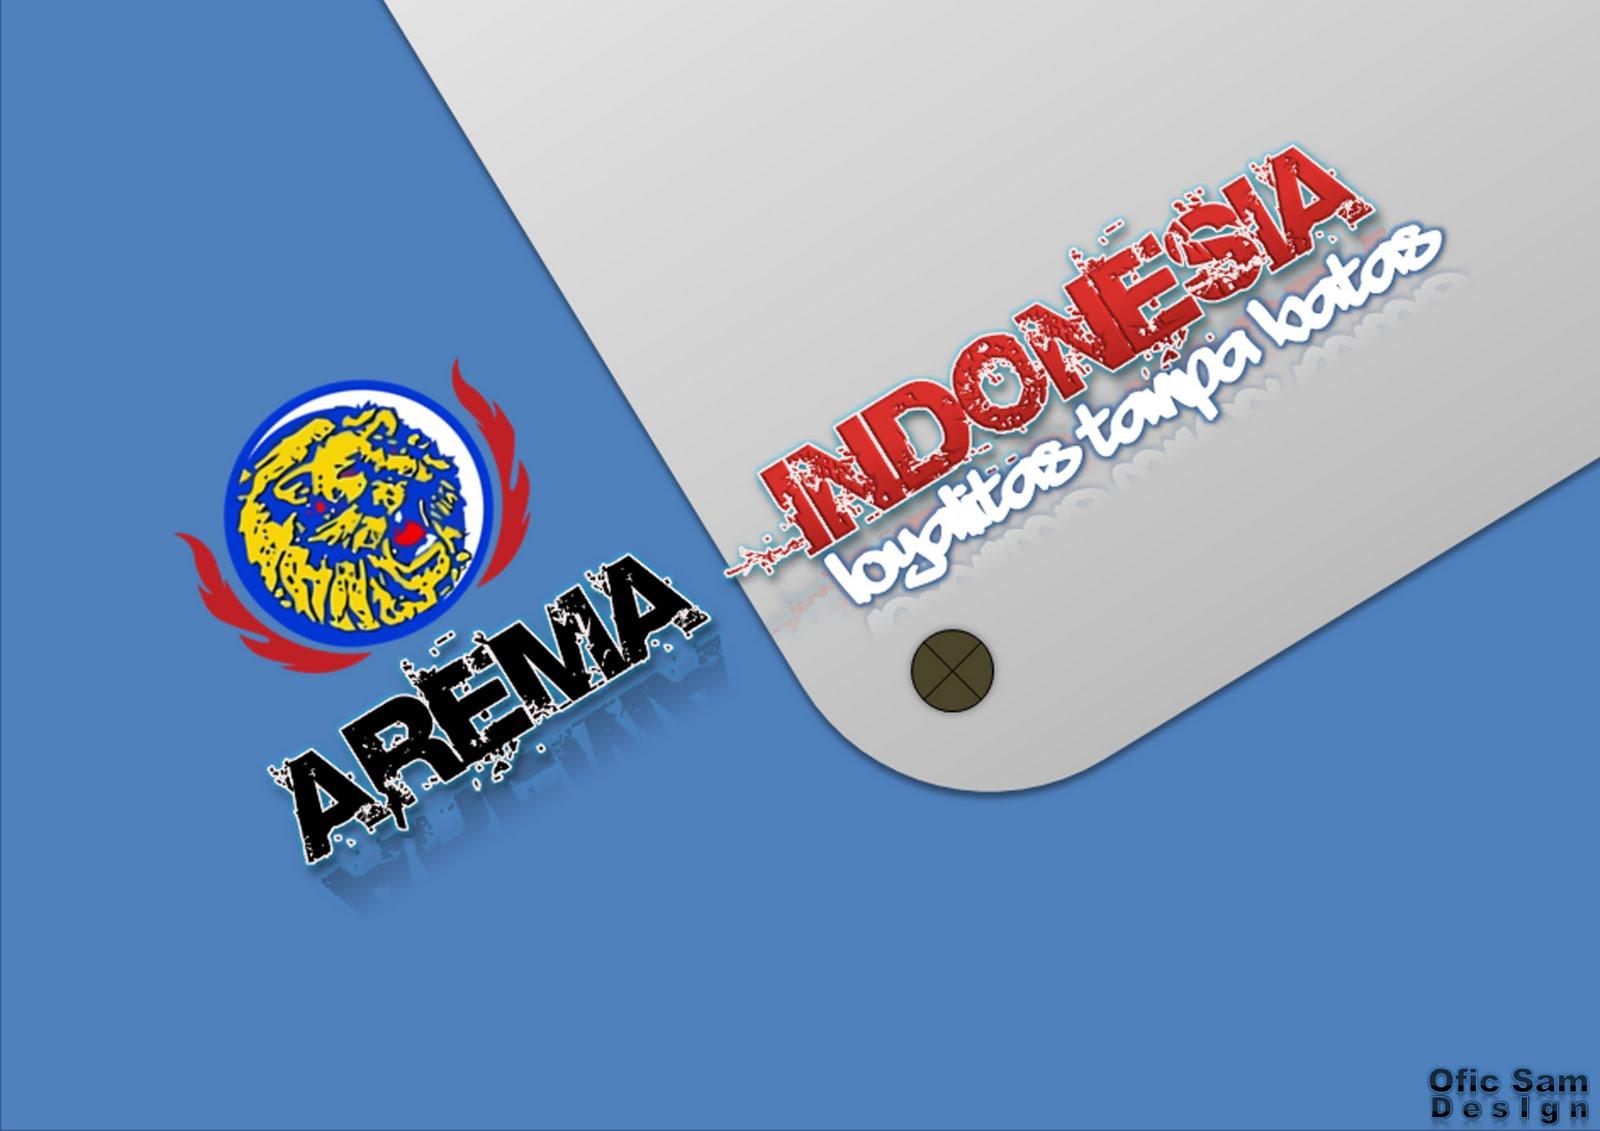 http://3.bp.blogspot.com/-m2G-_oZrqAU/Tb-Ij3o_lEI/AAAAAAAAAJU/I1oOi_fRnr8/s1600/wallpaper+arema+indonesia+mei+2011+by+ofic+sam+_boy_gassipers@yahoo.co.id+%282%29.jpg